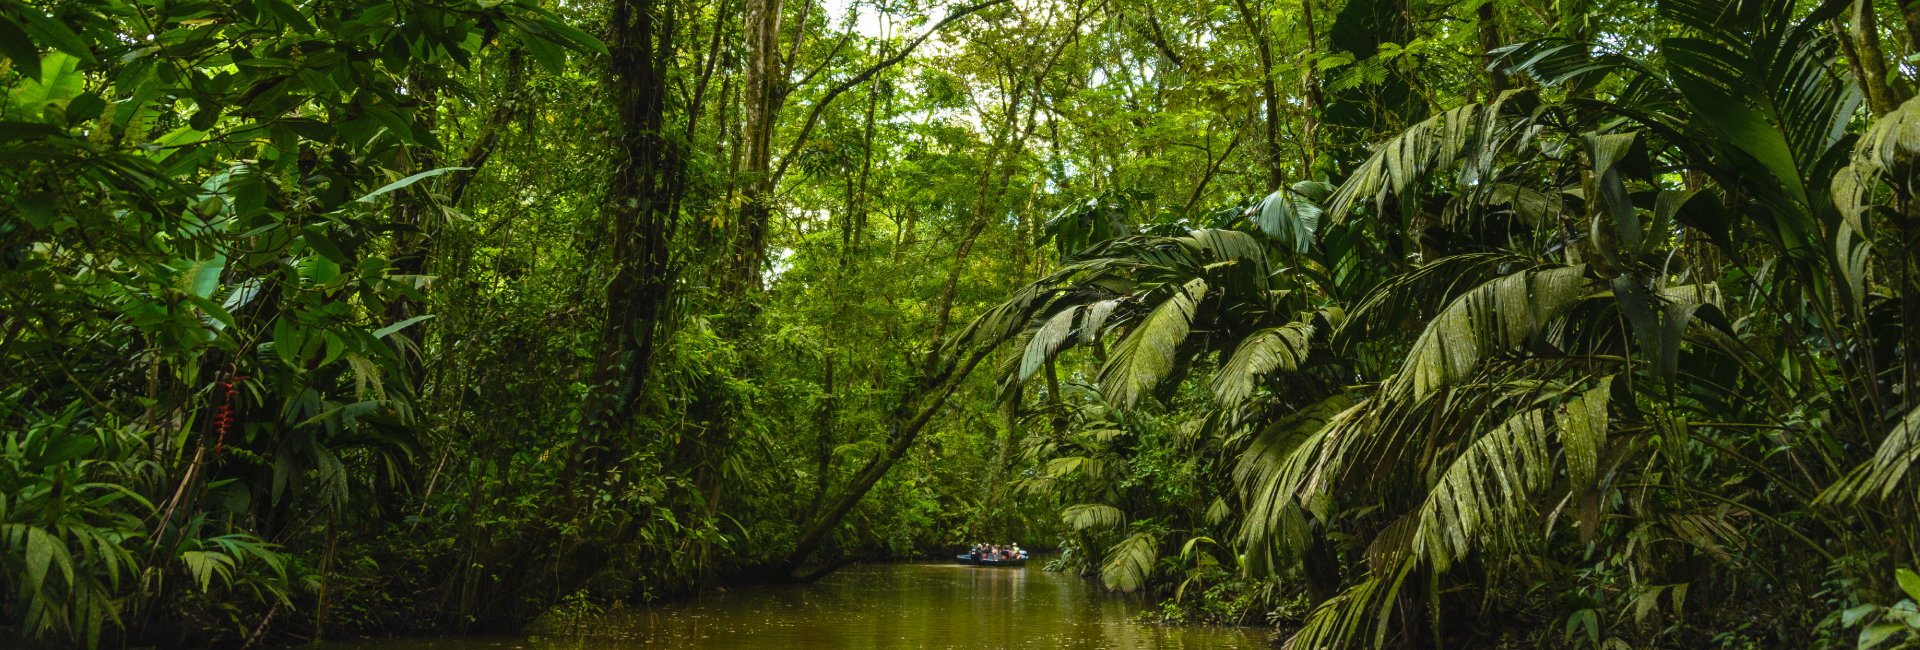 Tortuguero Canals in Costa Rica